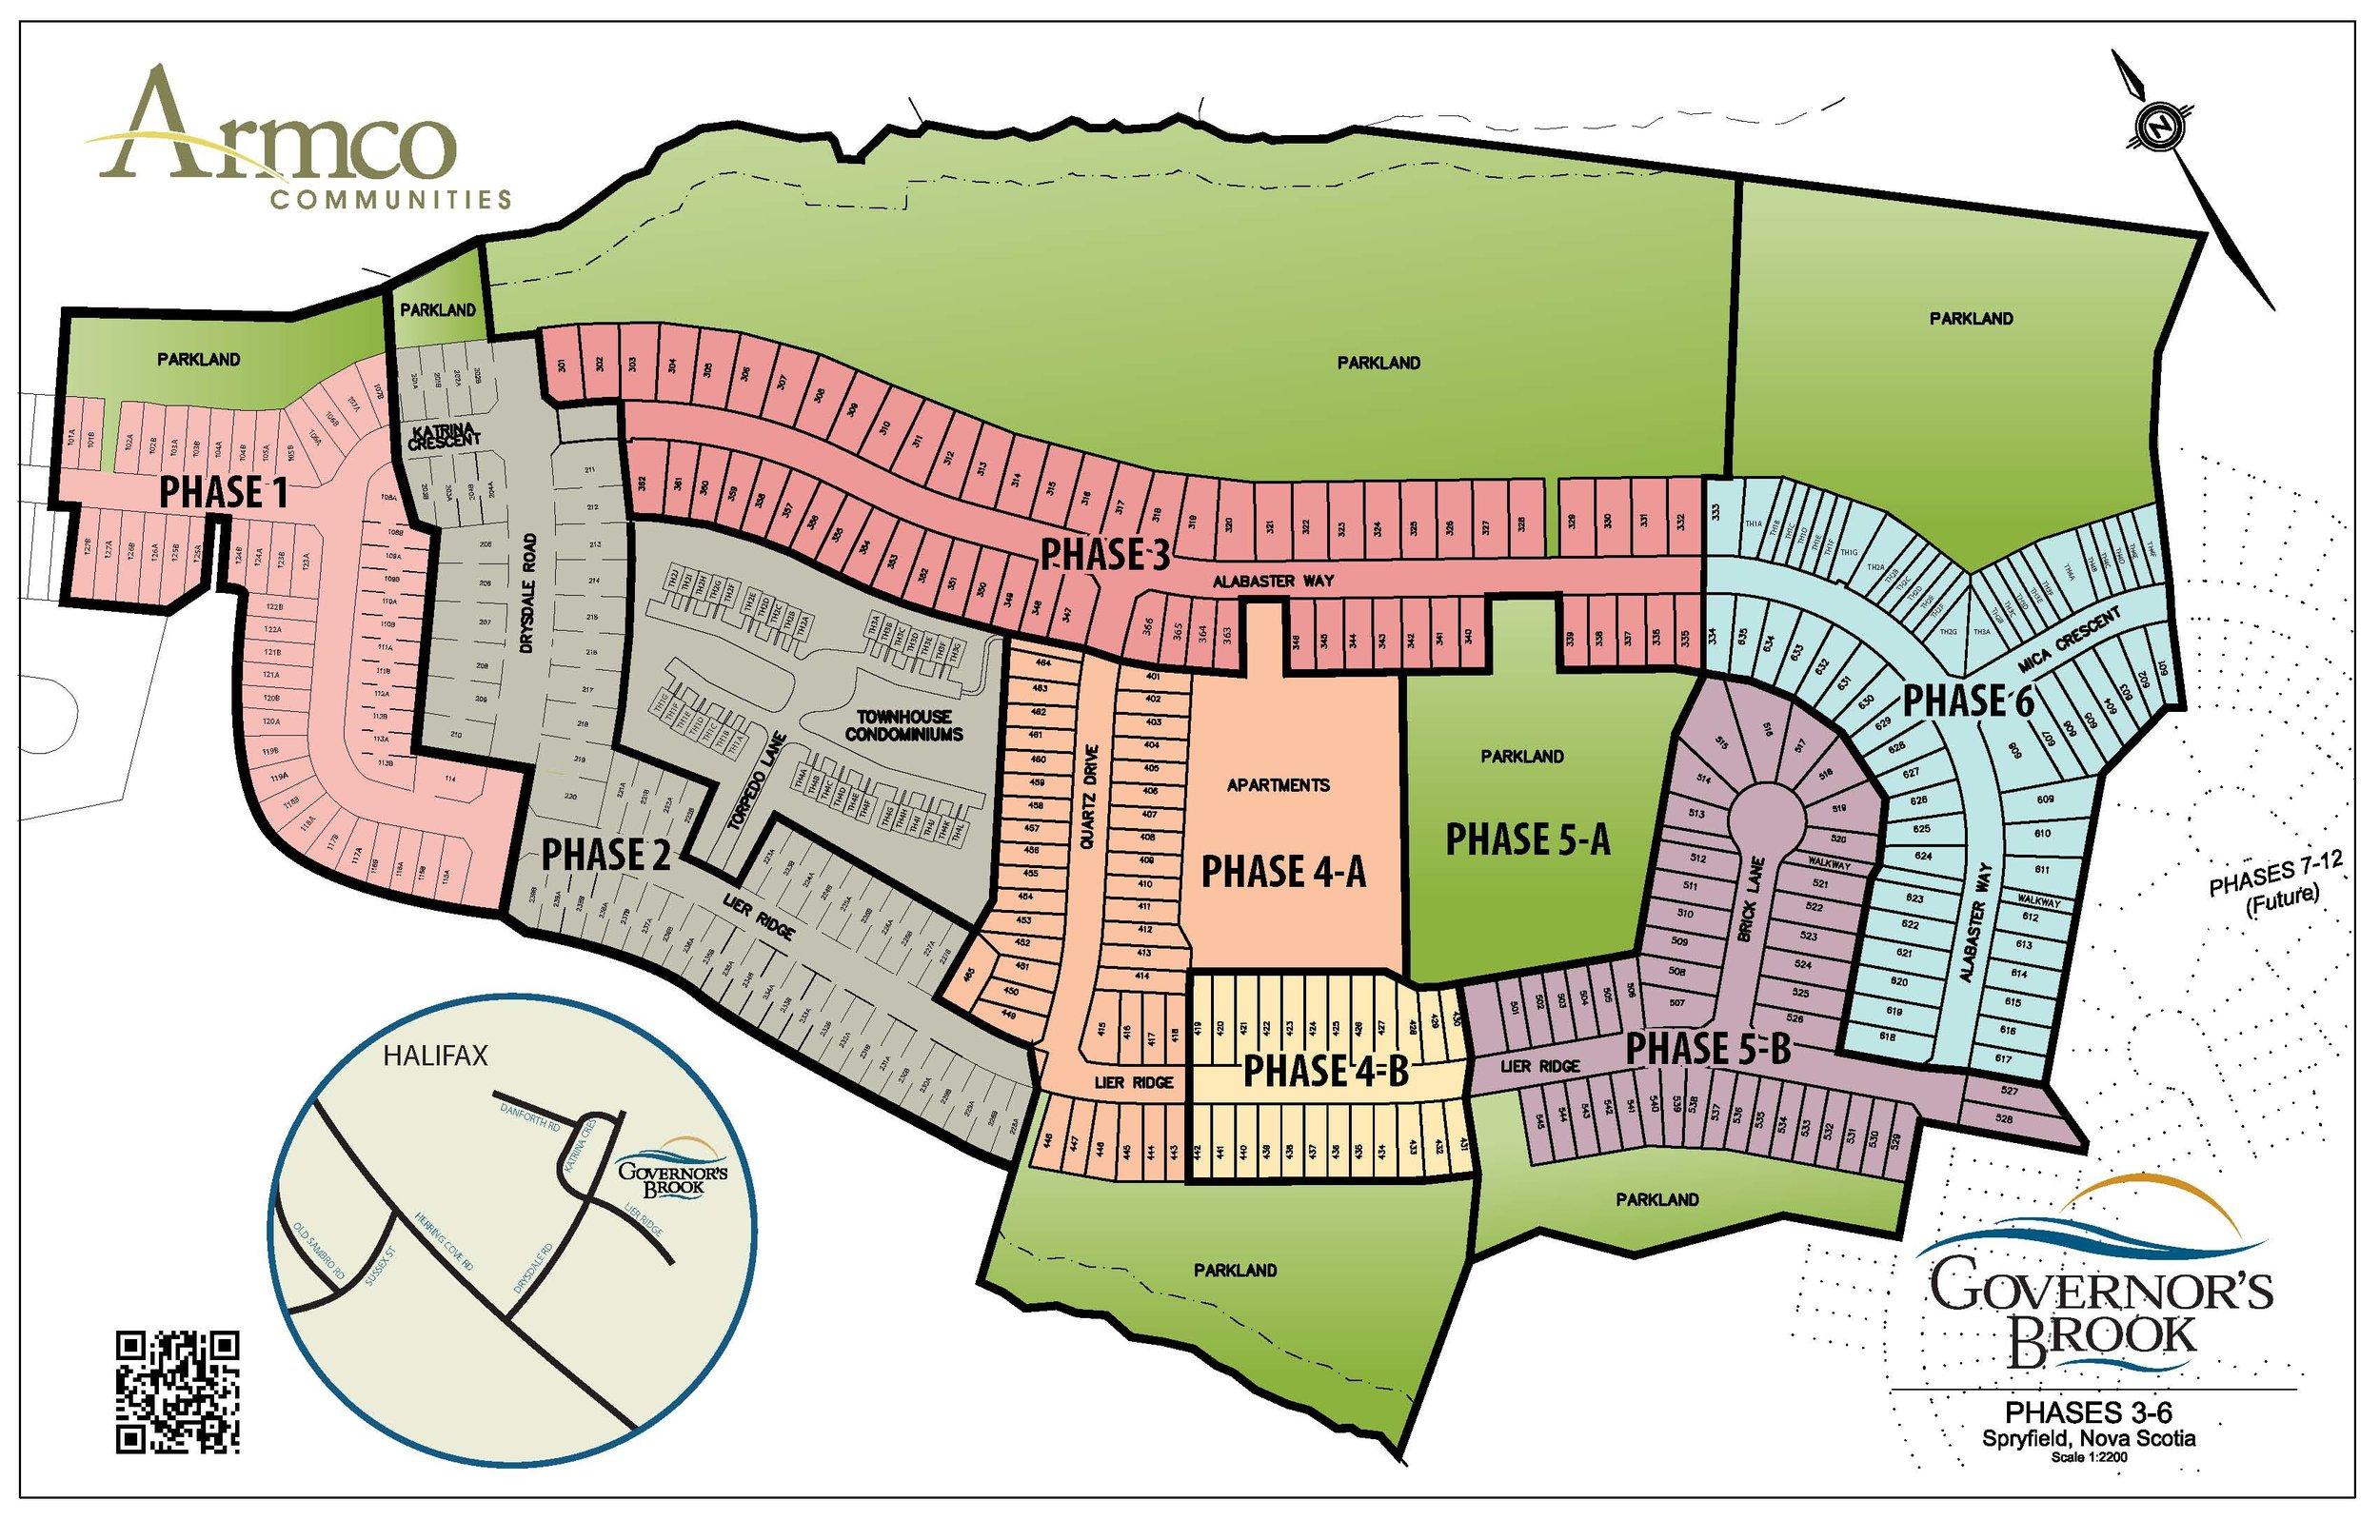 2012-02-21 GovBrook Maketing Plan Ph 3-6 Overall - COLOR.jpg